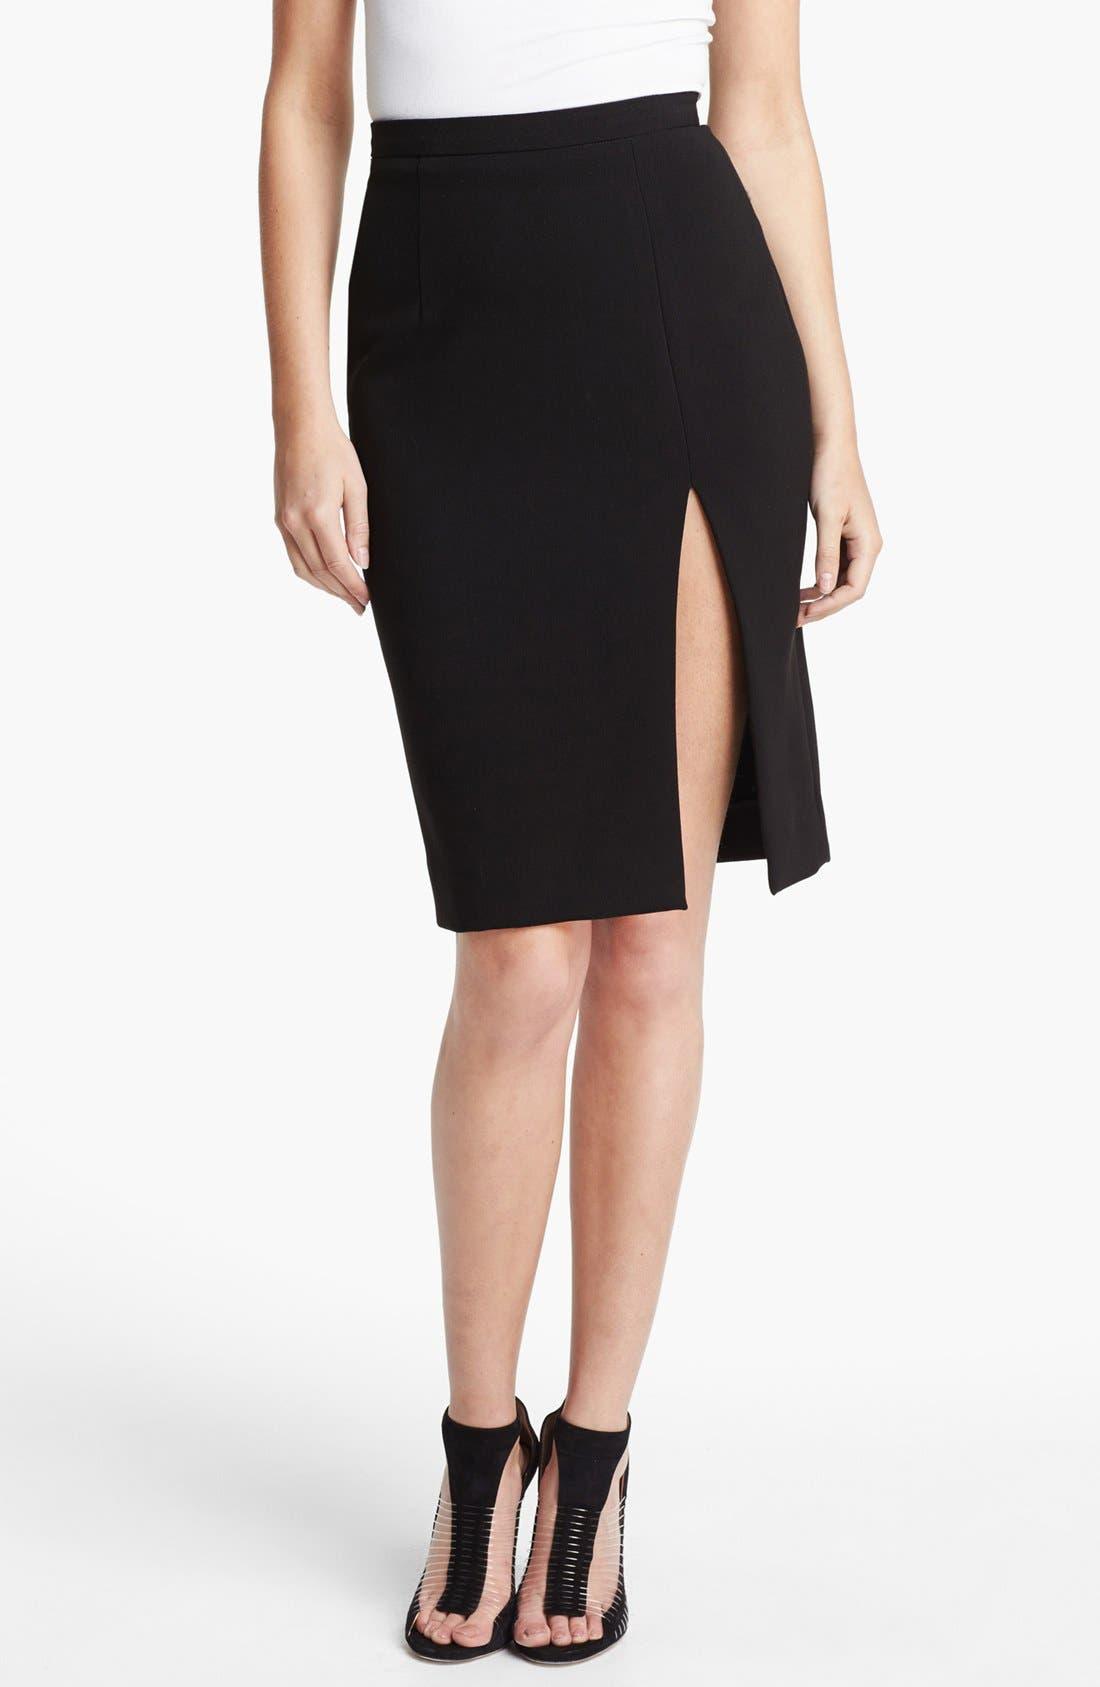 Alternate Image 1 Selected - L'AGENCE High Slit Pencil Skirt